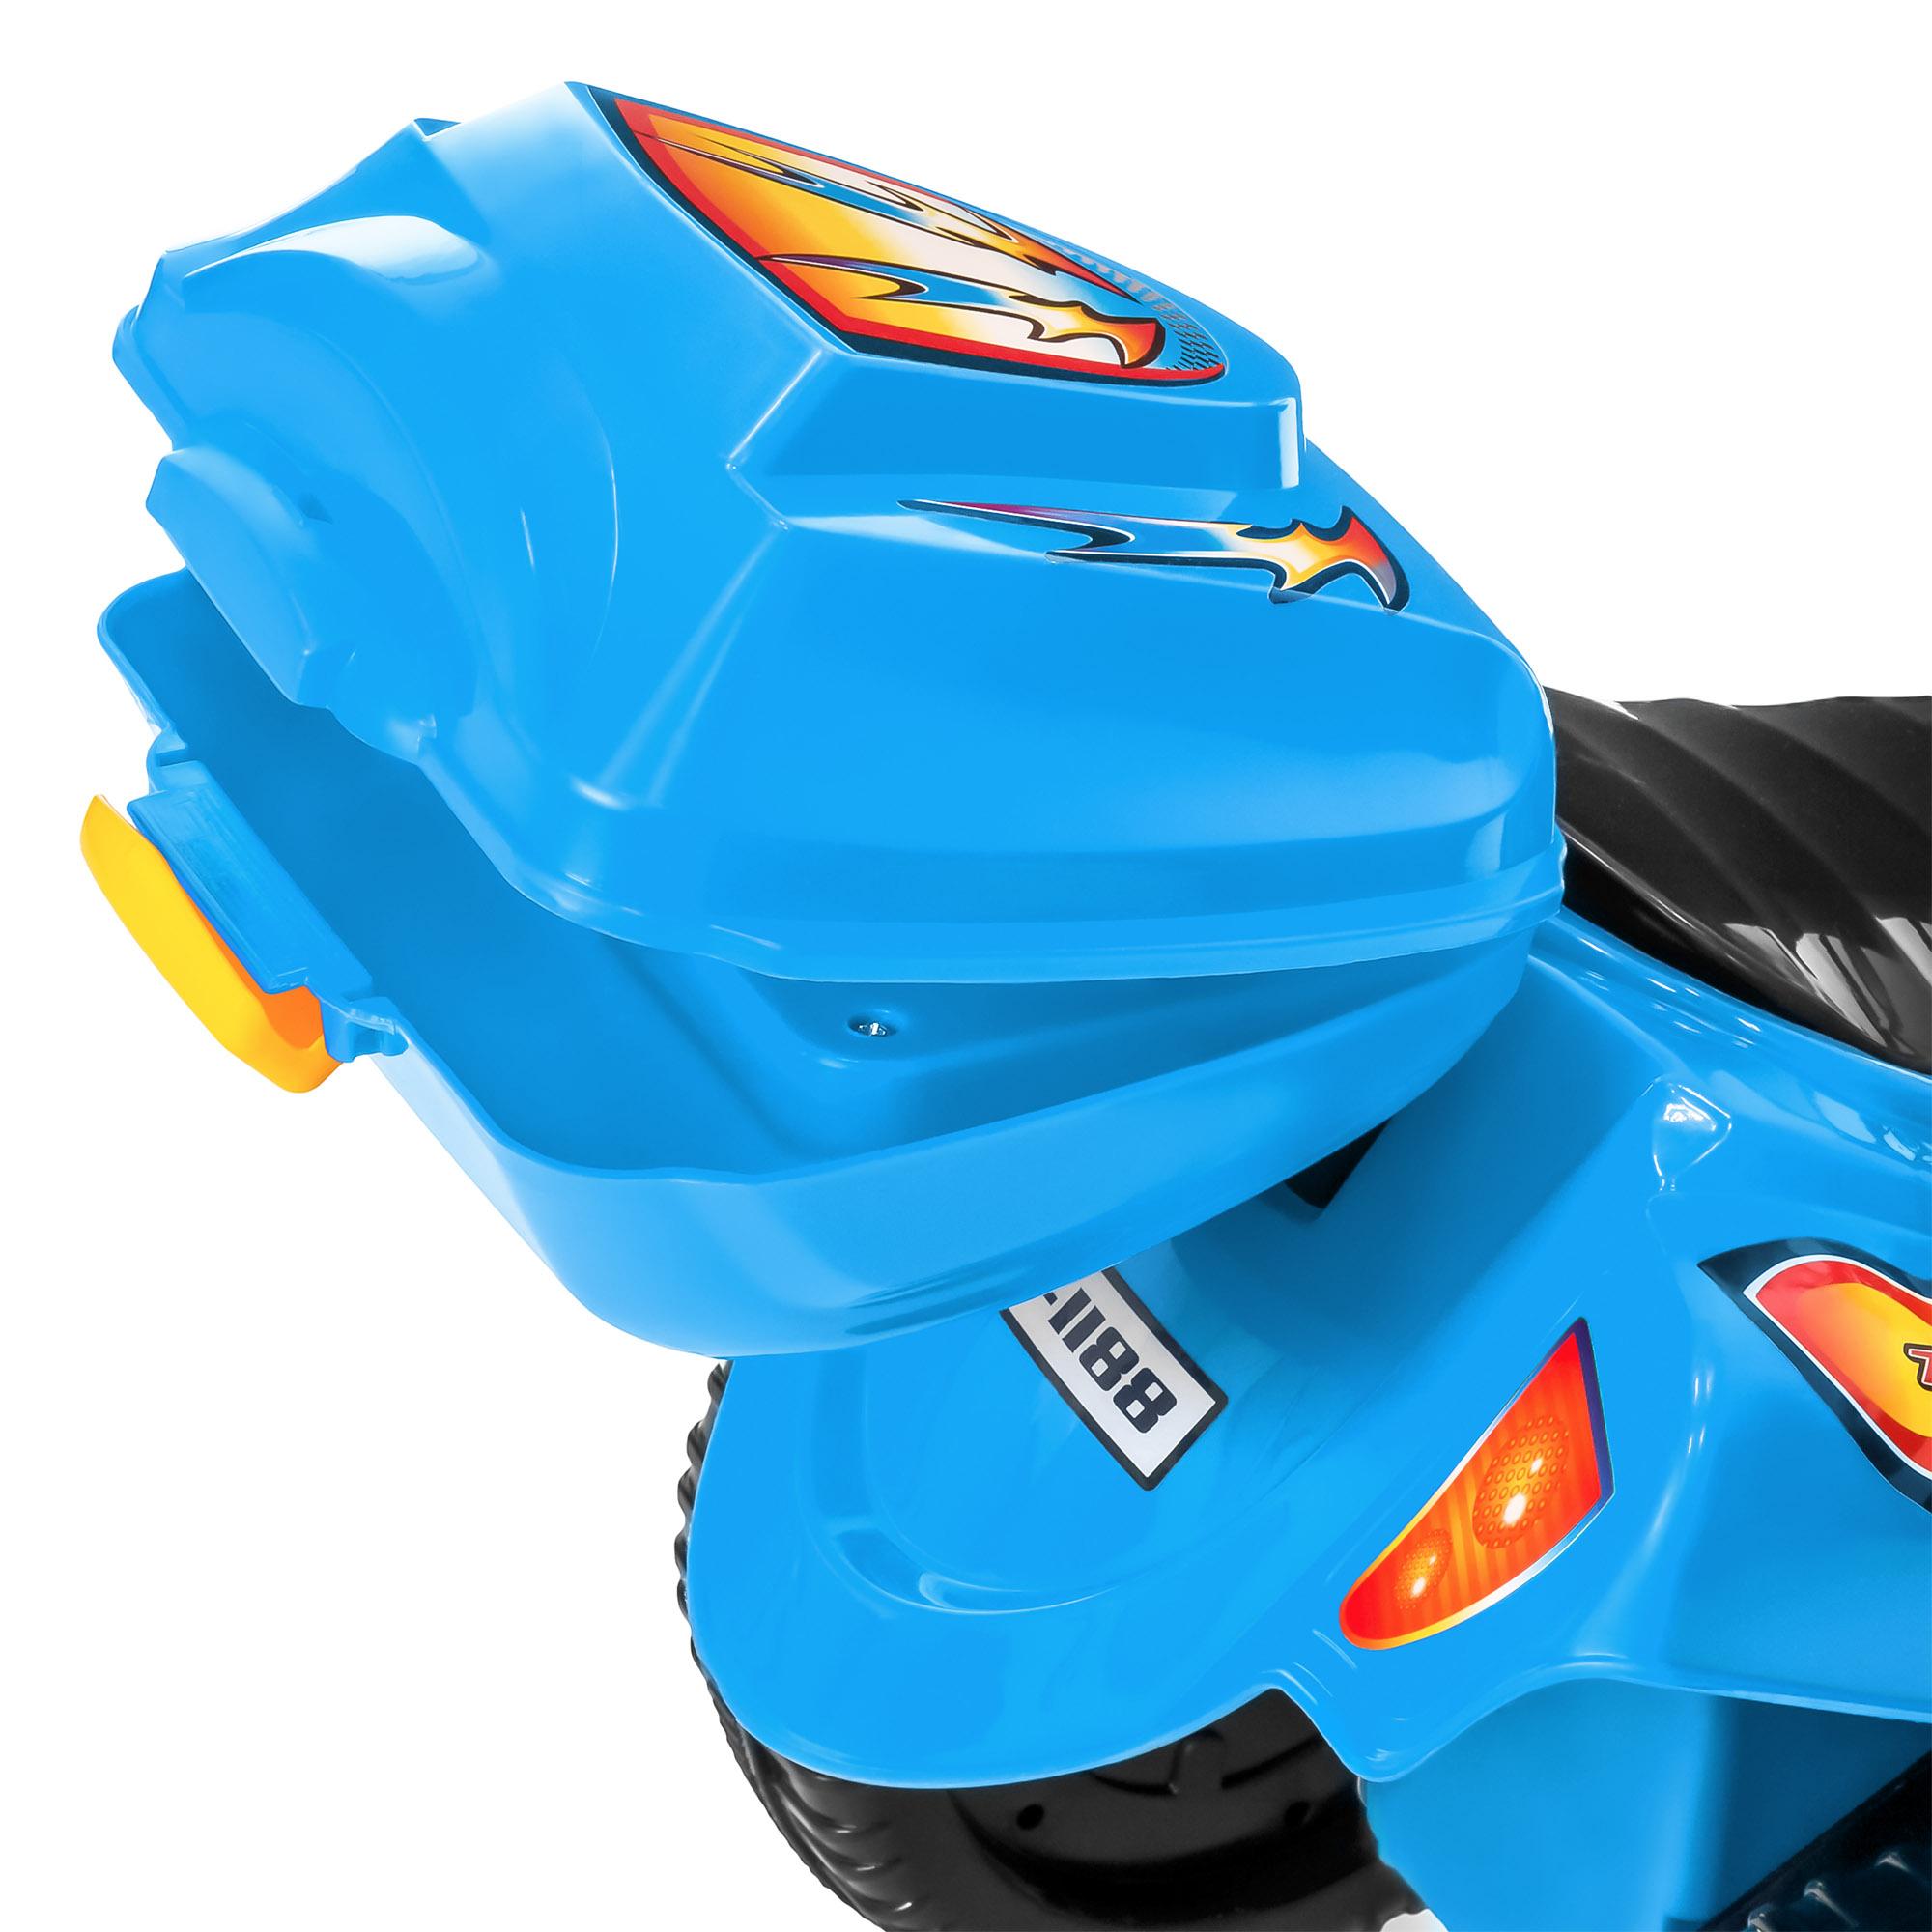 BCP-6V-Kids-3-Wheel-Motorcycle-Ride-On-Toy-w-LED-Lights-Music-Storage thumbnail 16